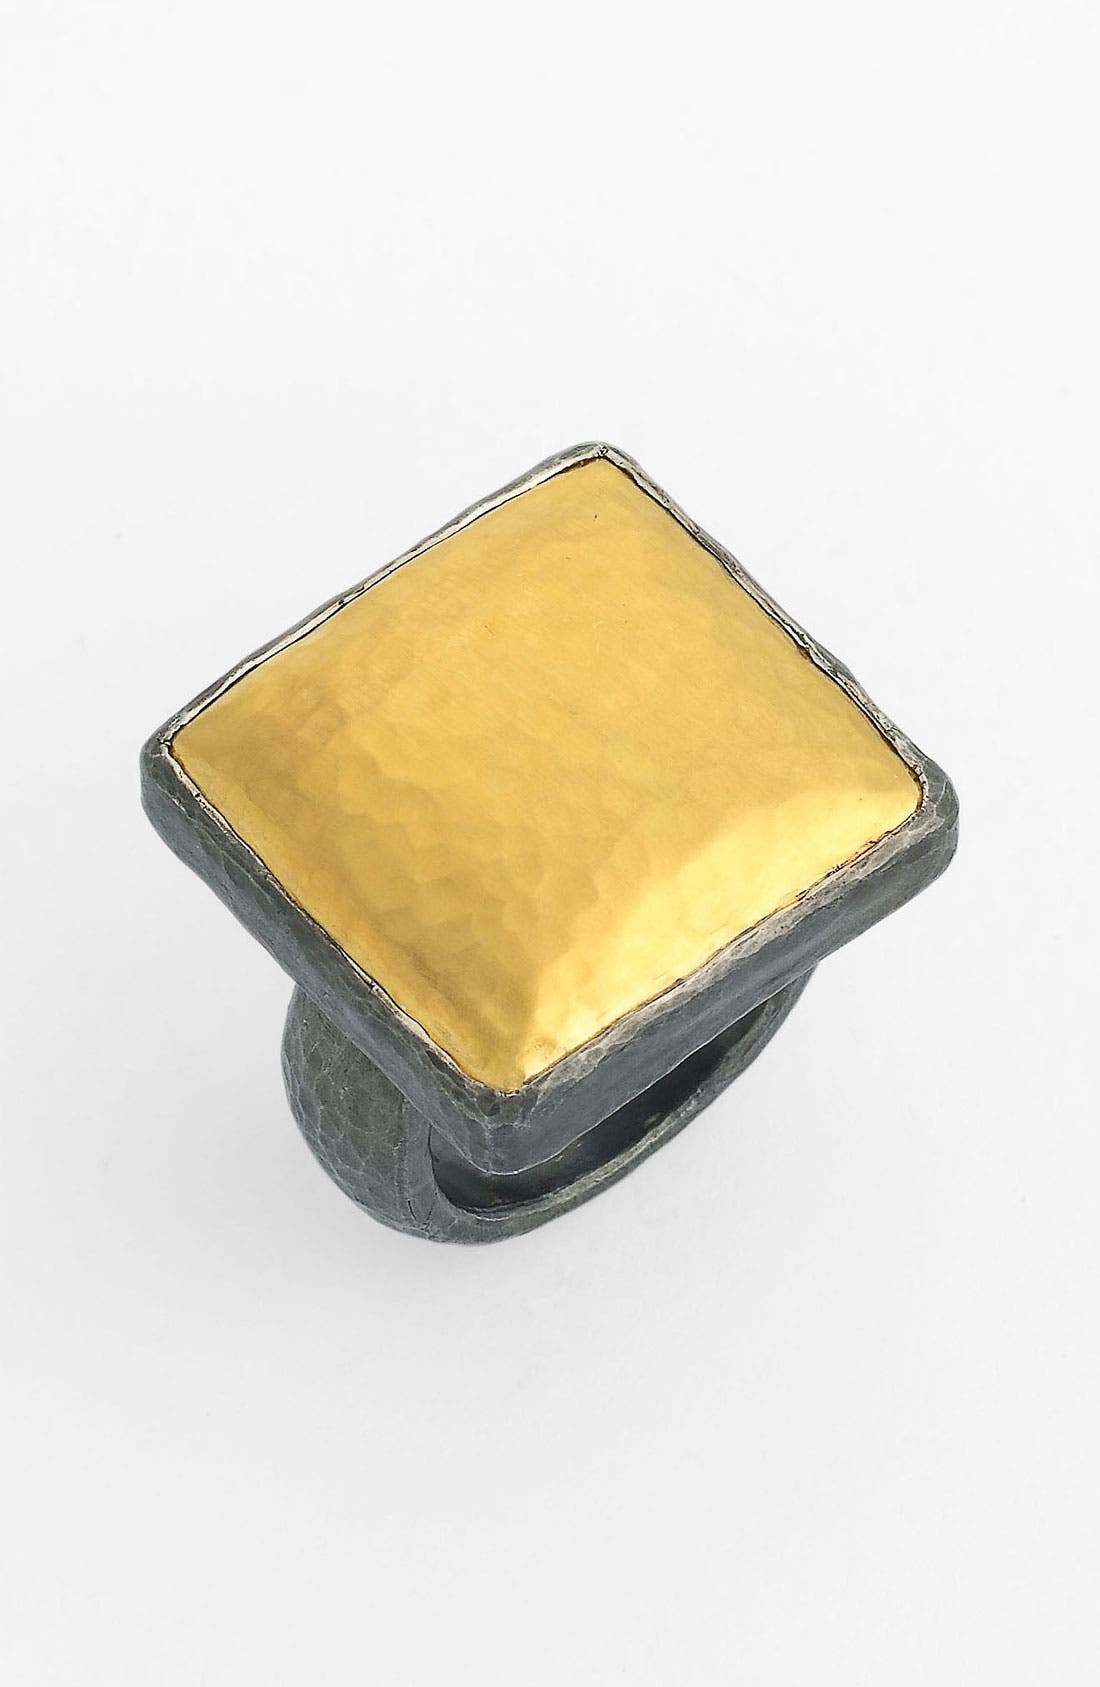 Alternate Image 1 Selected - Gurhan 'Amulet' Square Ring